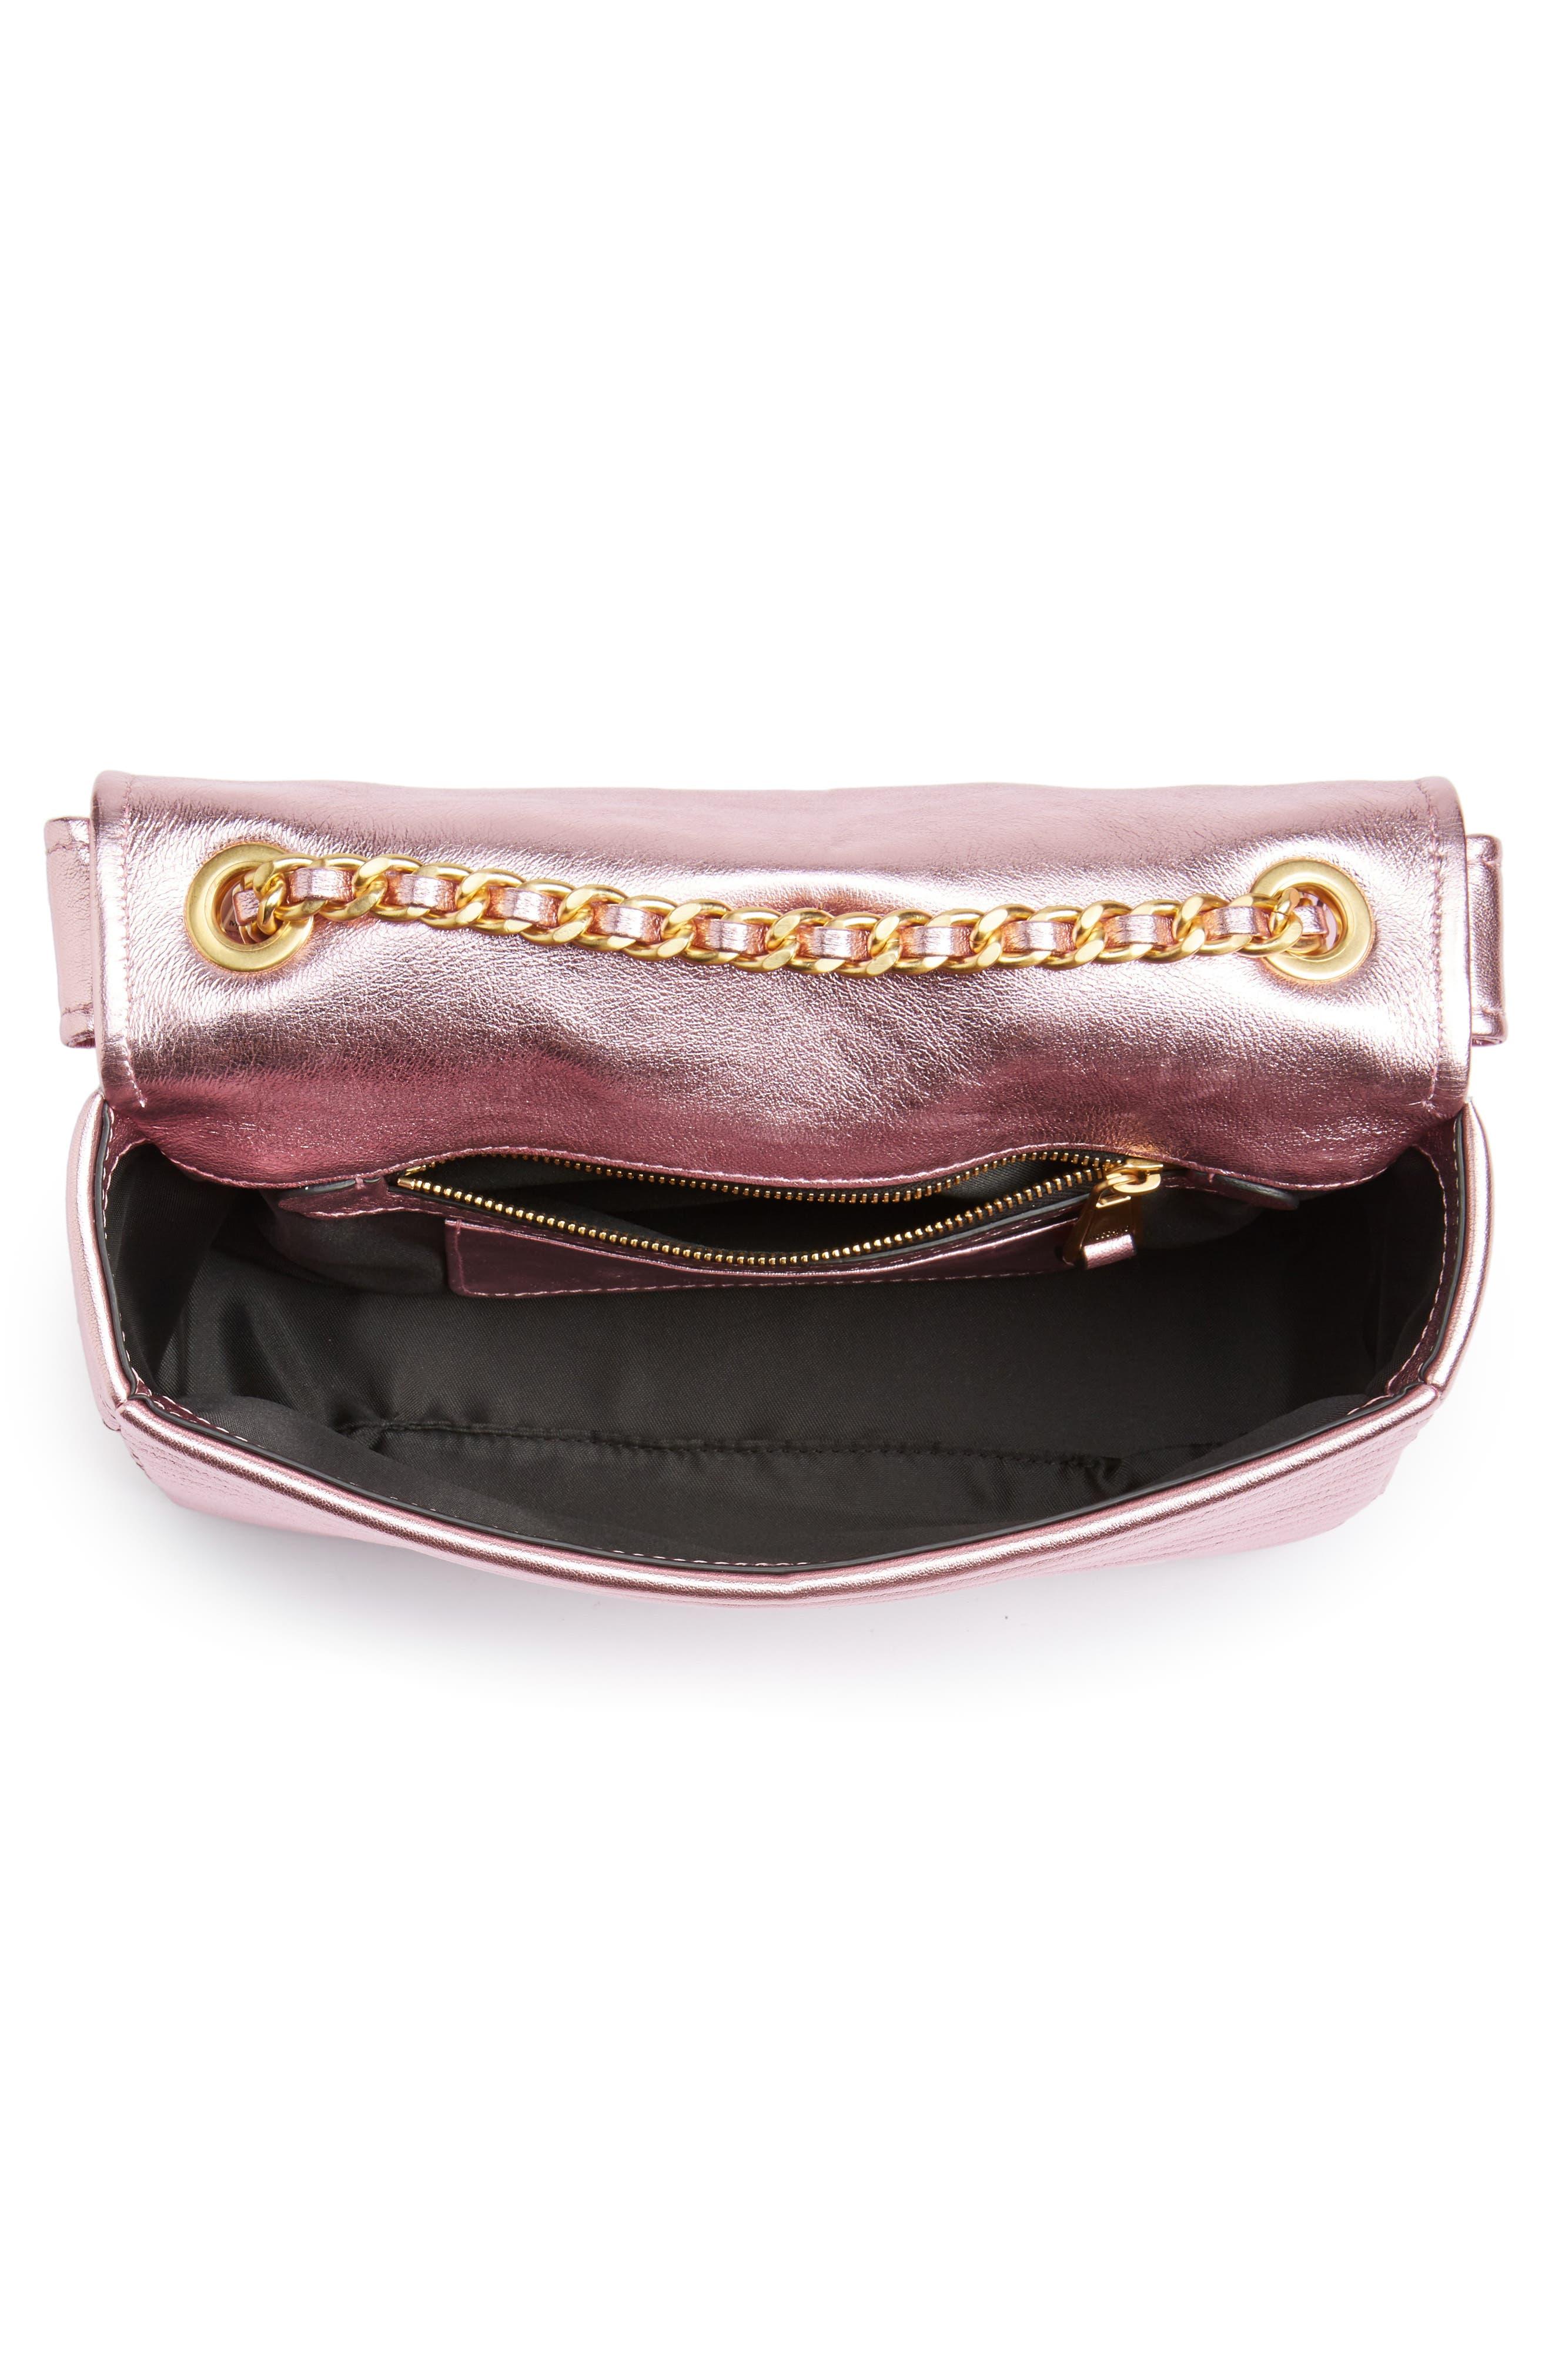 x My Little Pony Biker Jacket Metallic Leather Crossbody Bag,                             Alternate thumbnail 4, color,                             Pink